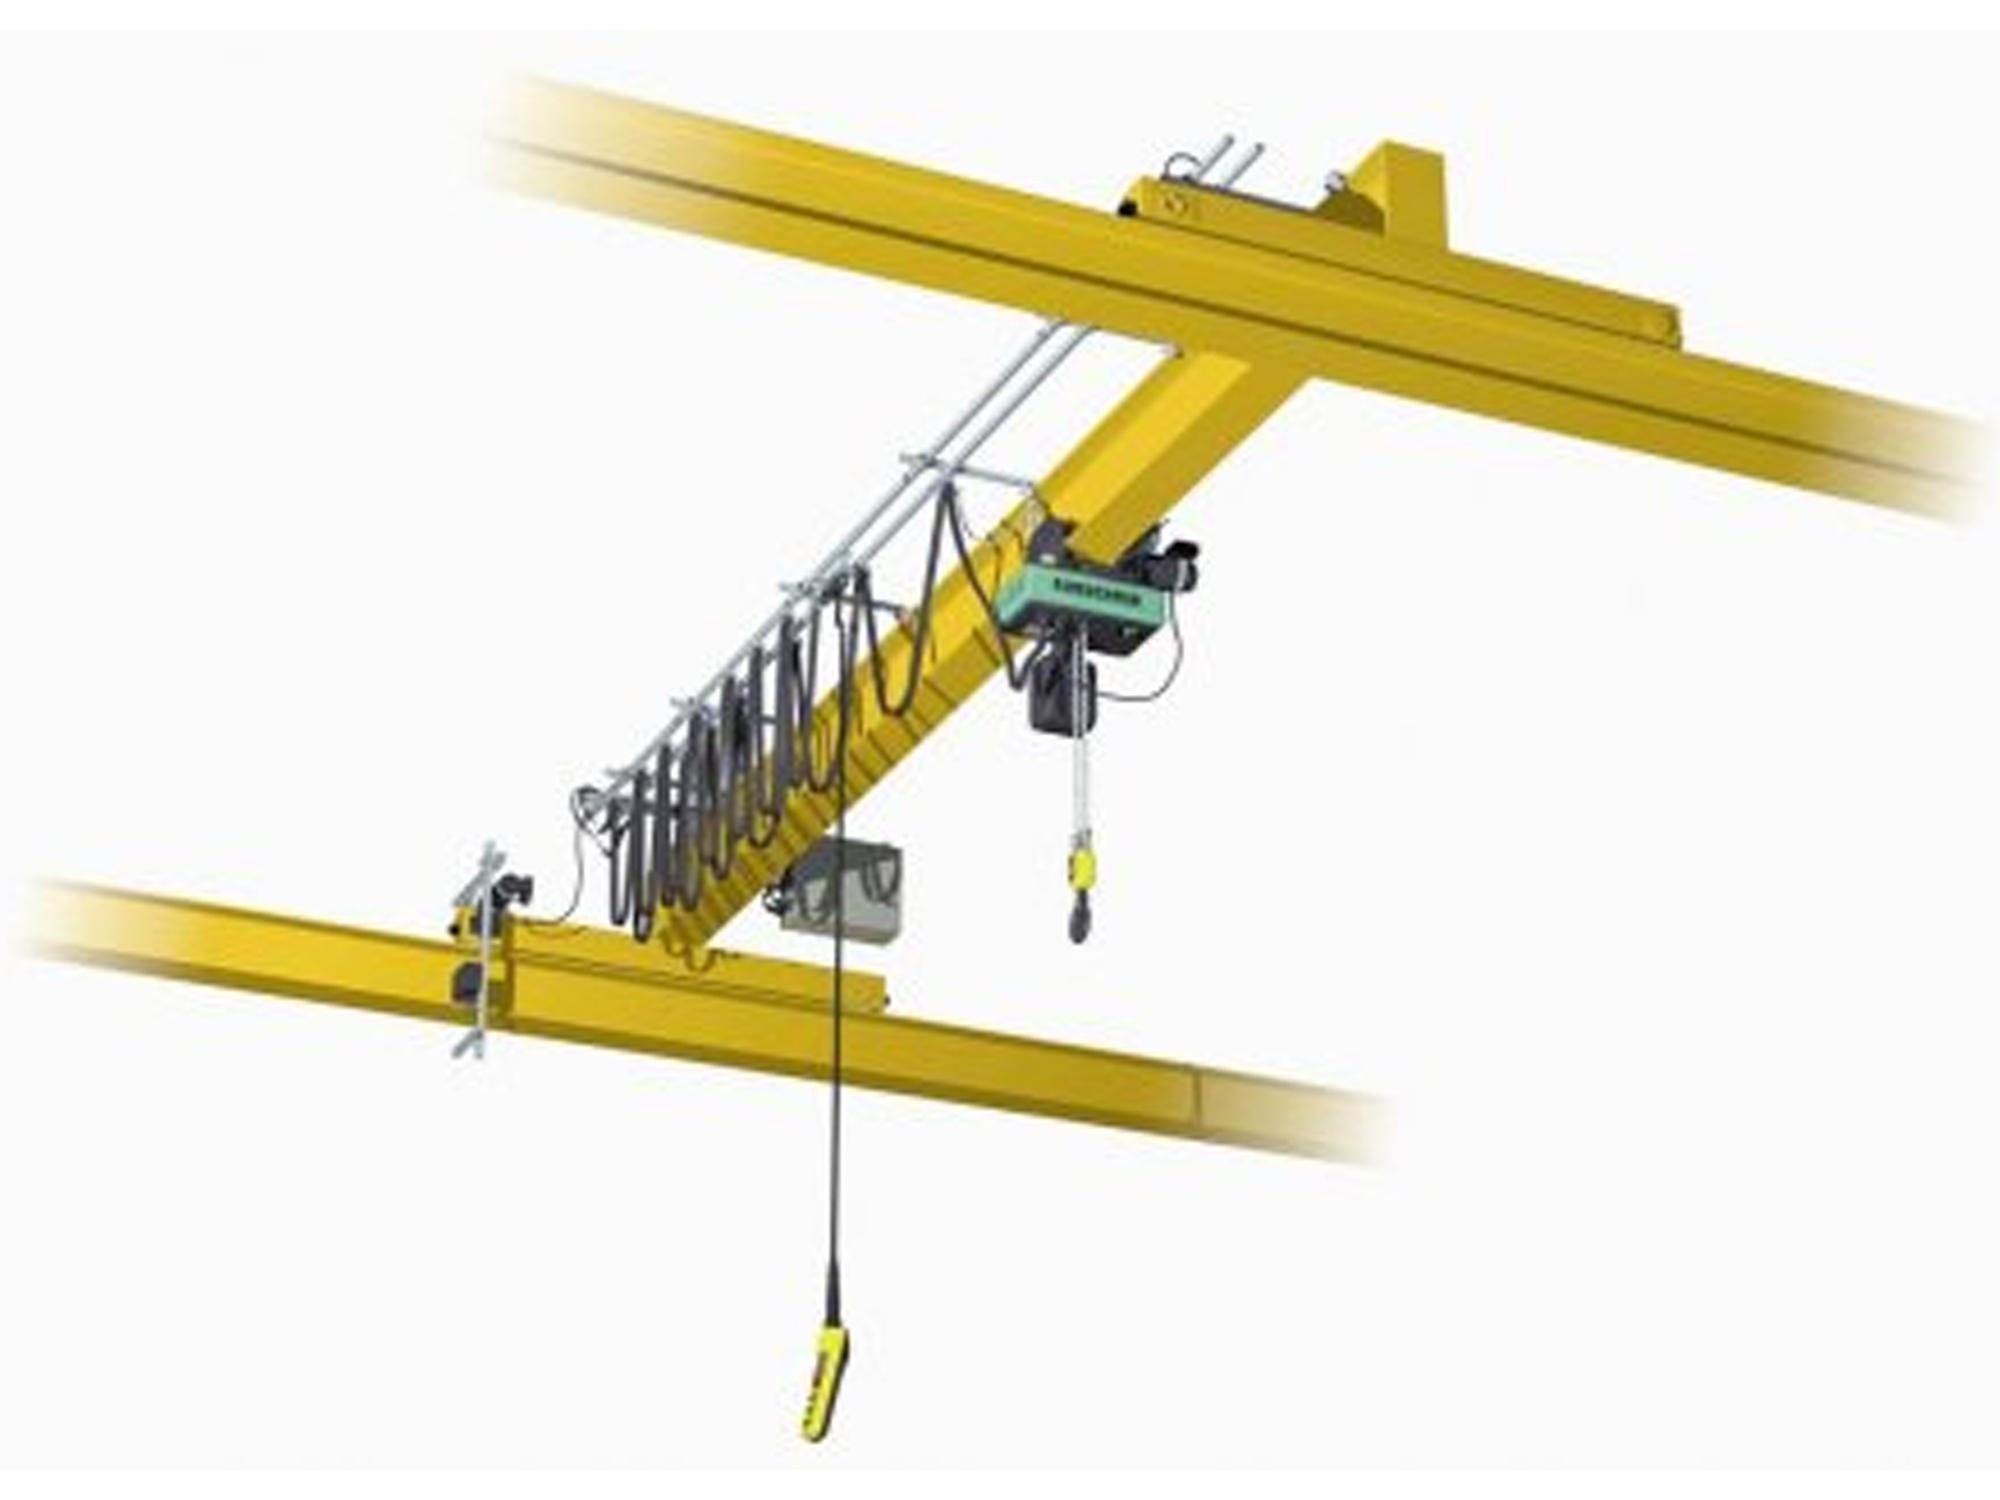 Overhead Crane Beam Design : Single girder overhead crane top running with chain hoist